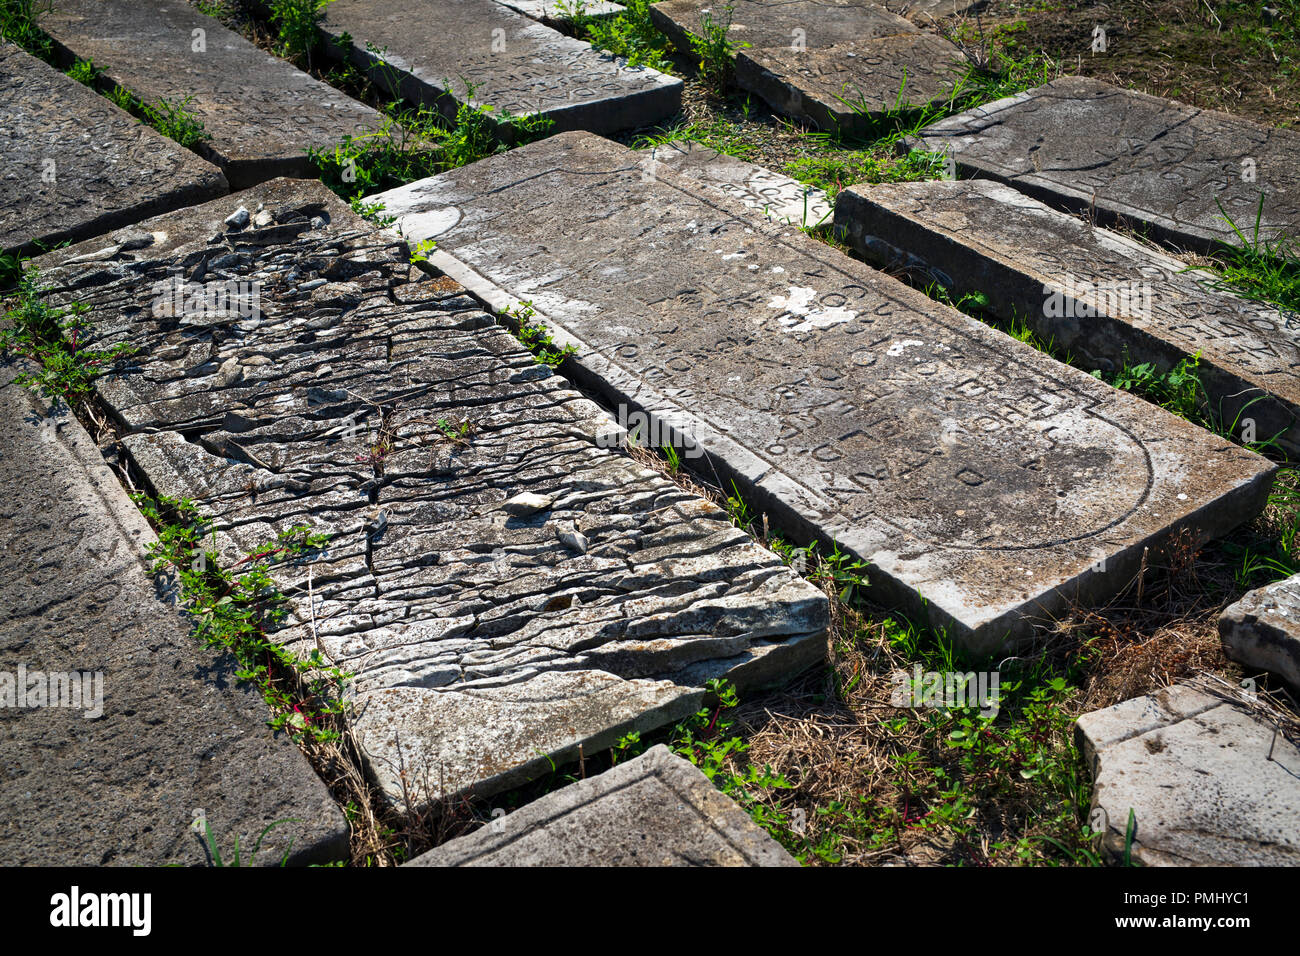 Allée De Niert Bayonne burials stock photos & burials stock images - alamy